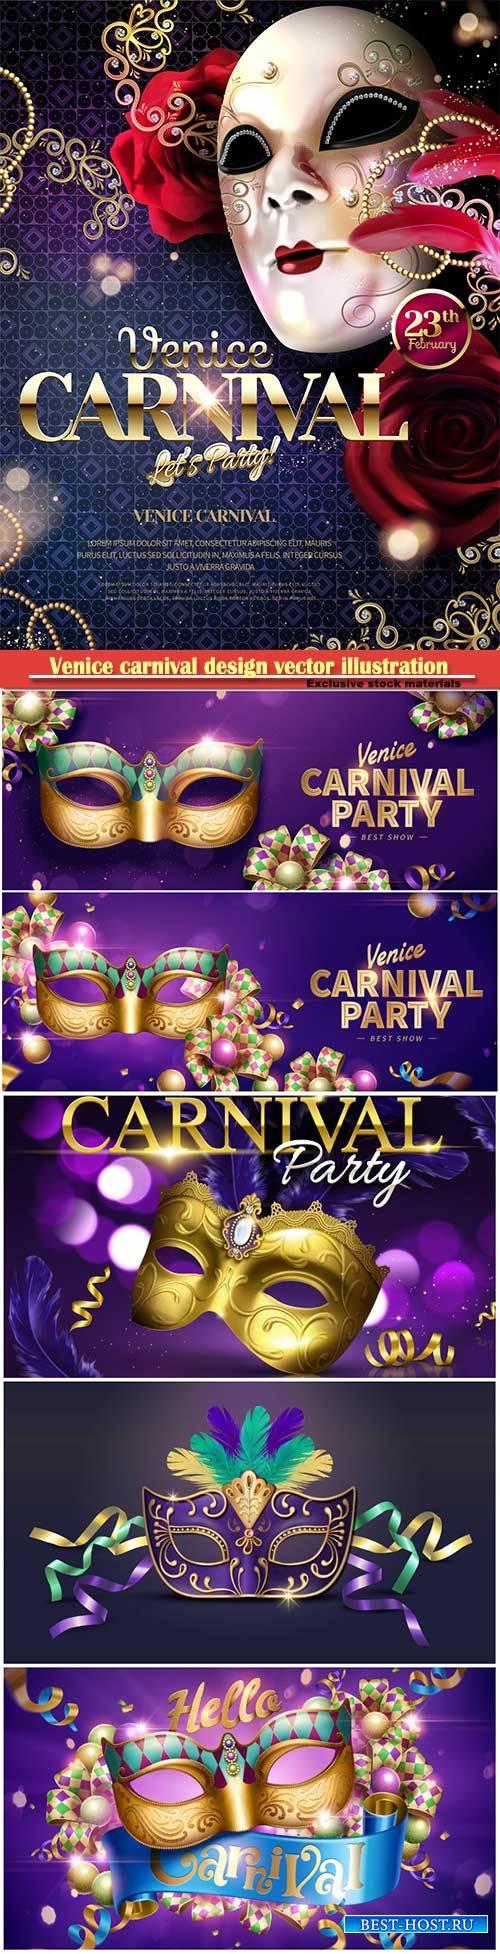 Venice carnival design vector illustration, Mardi gras # 6